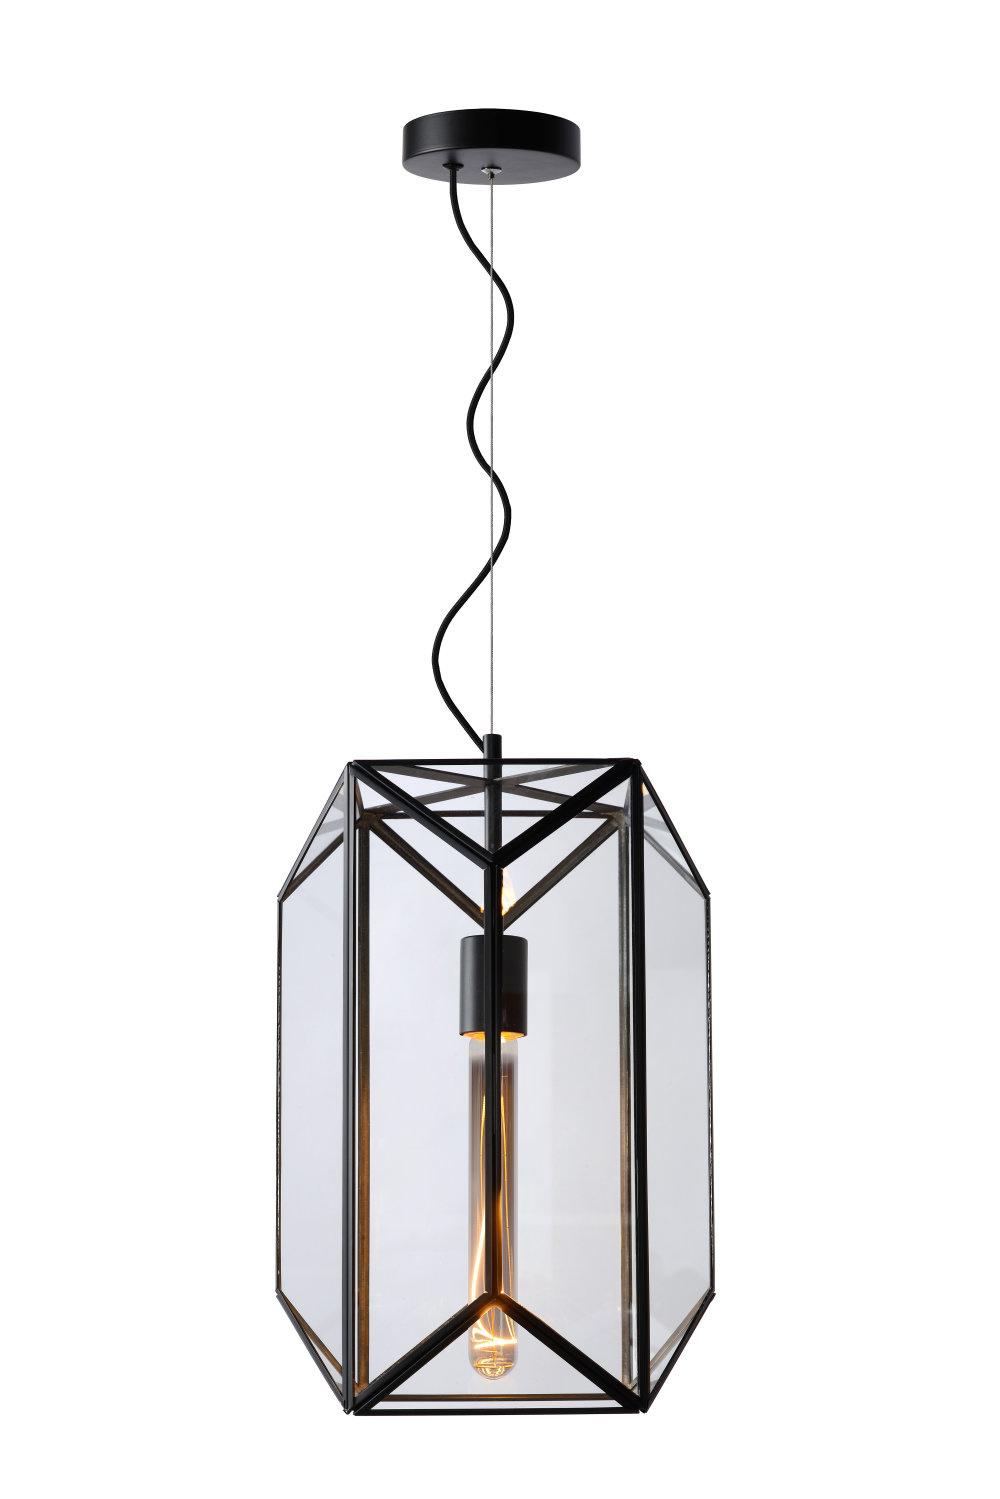 Lucide FERN Hanglamp-Zwart-Ø28-1xE27-60W-Glas